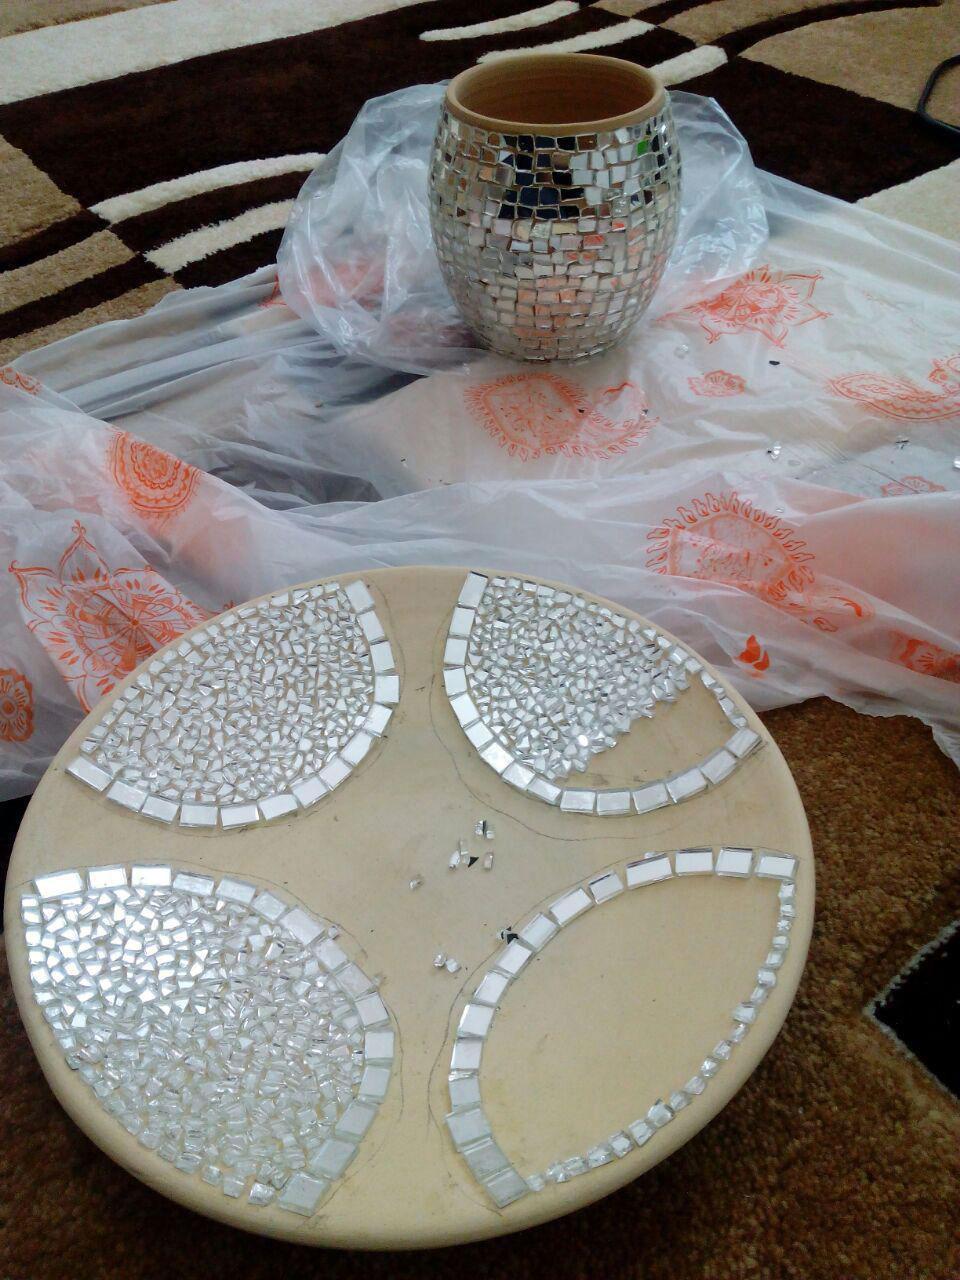 آموزش آینه کاری , آینه کاری ظروف